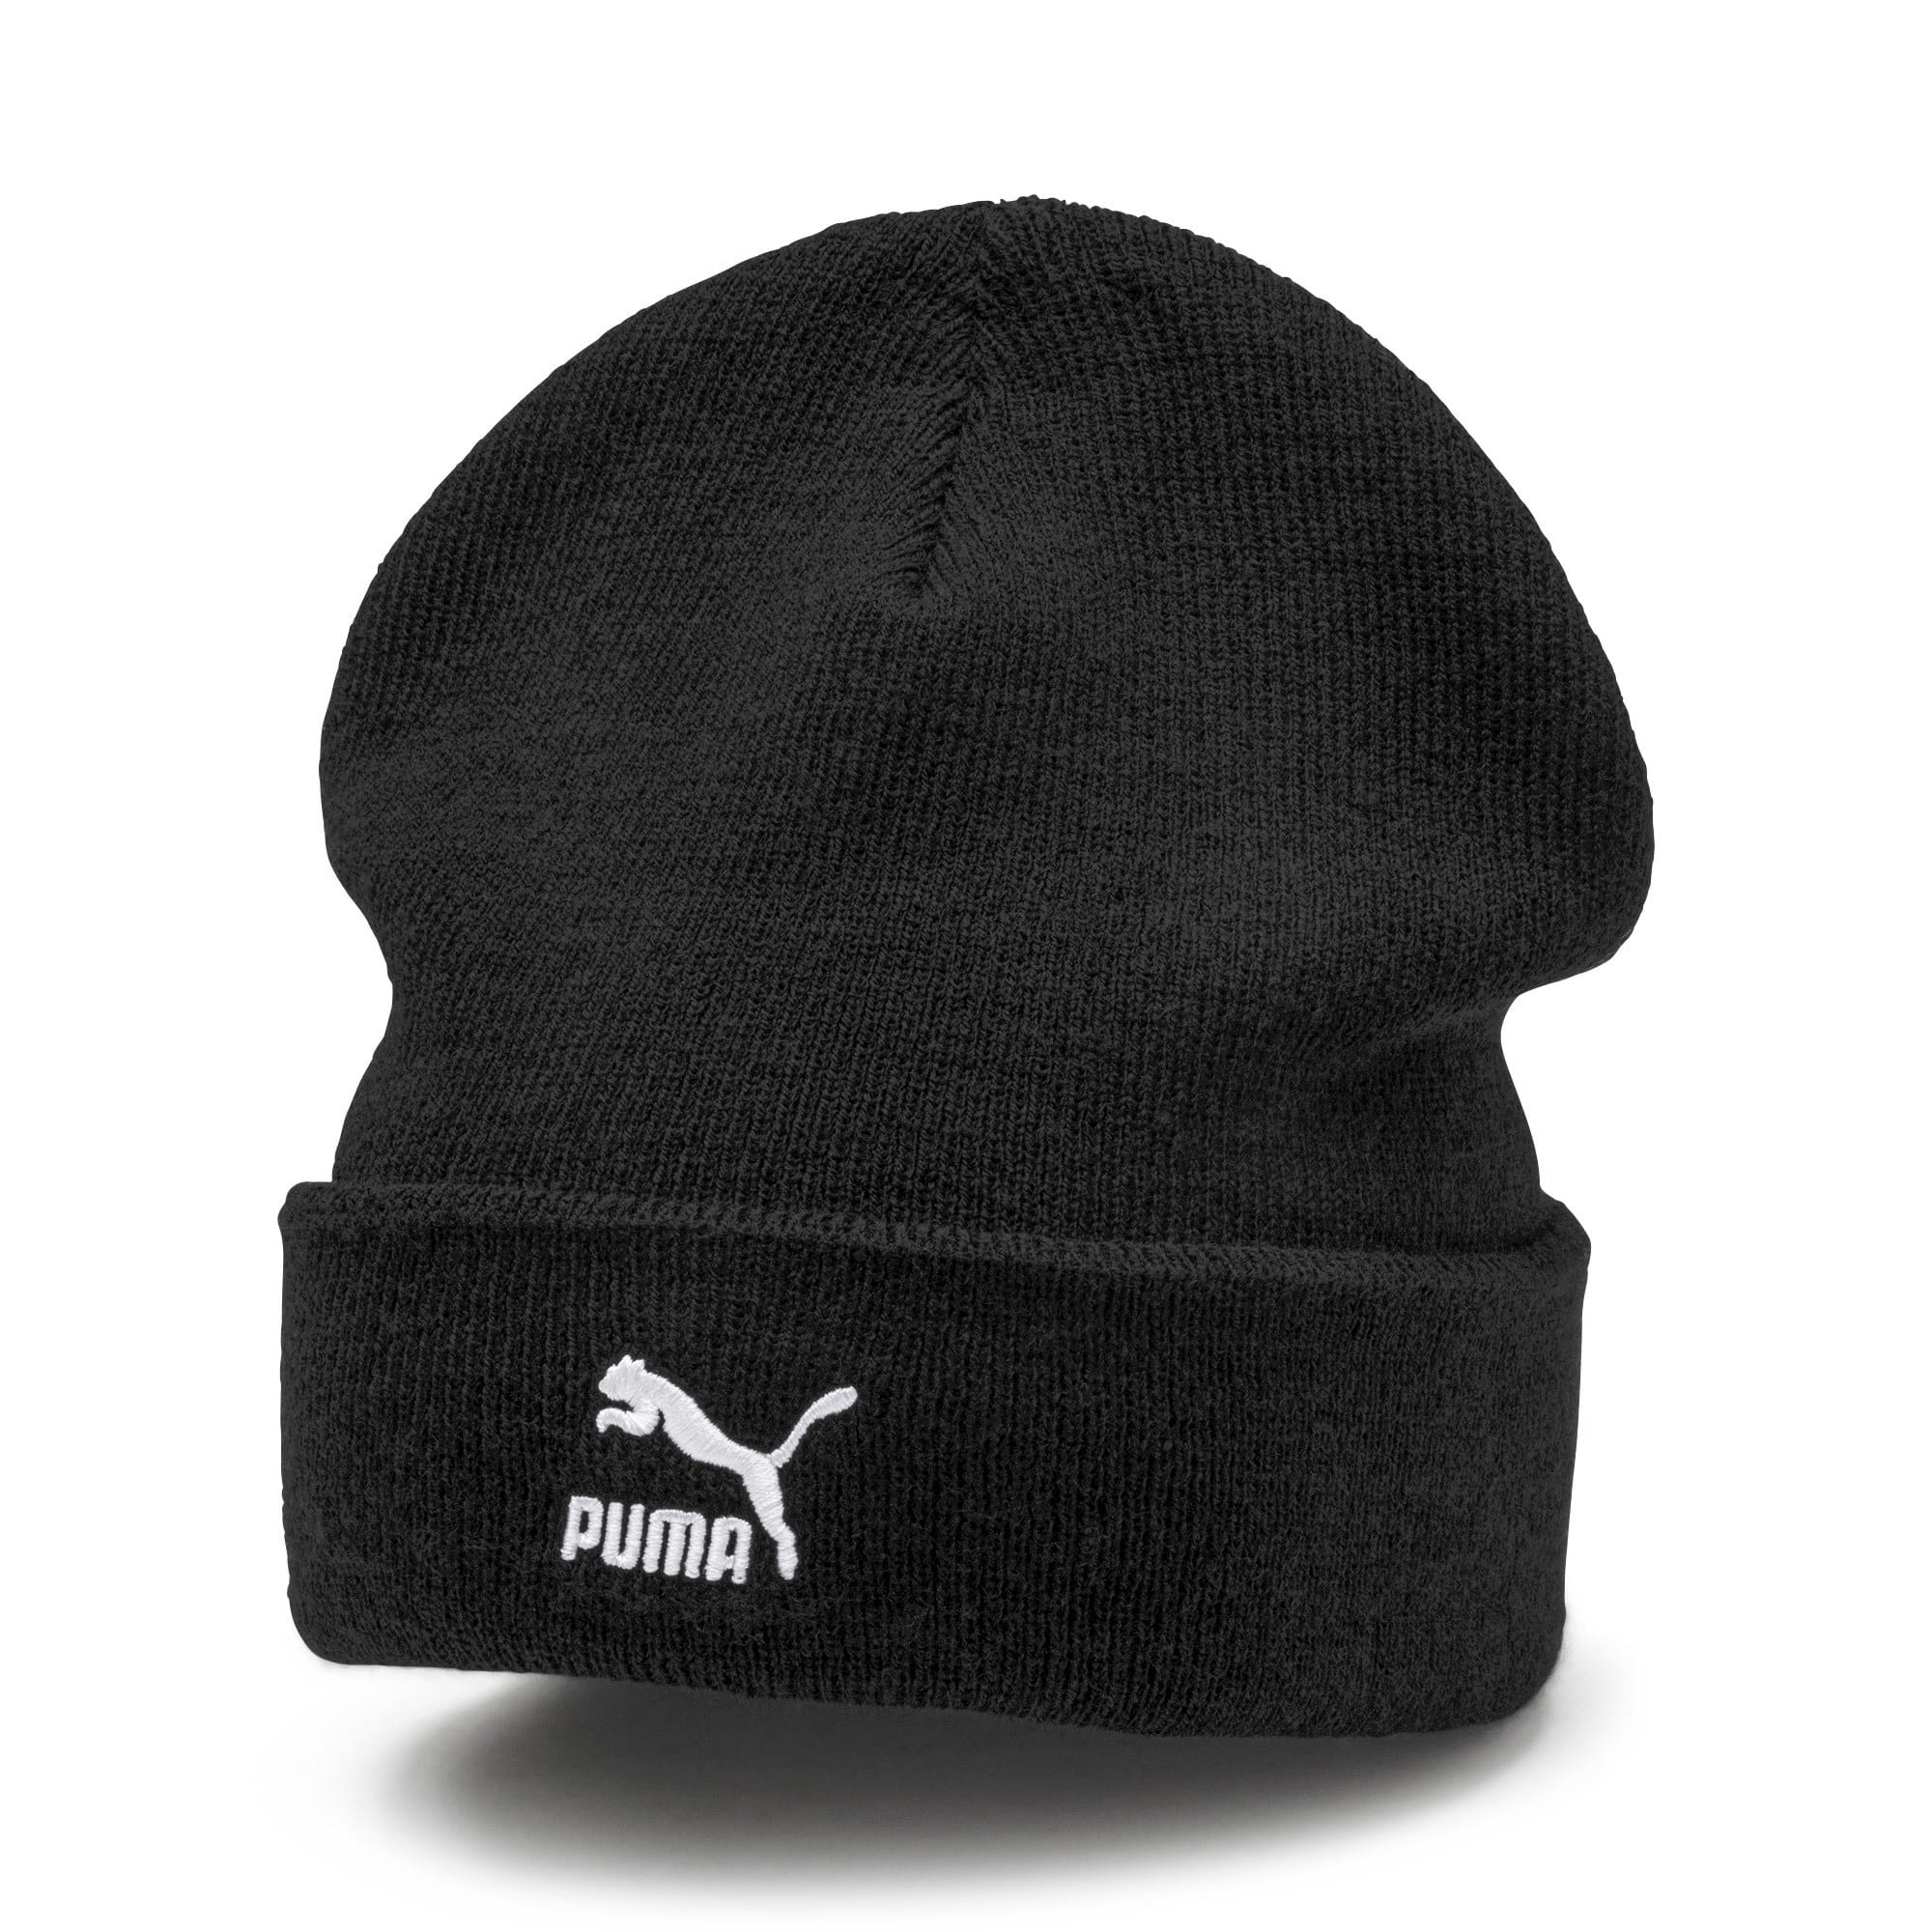 Thumbnail 1 of Archive Mid Fit Beanie, Puma Black, medium